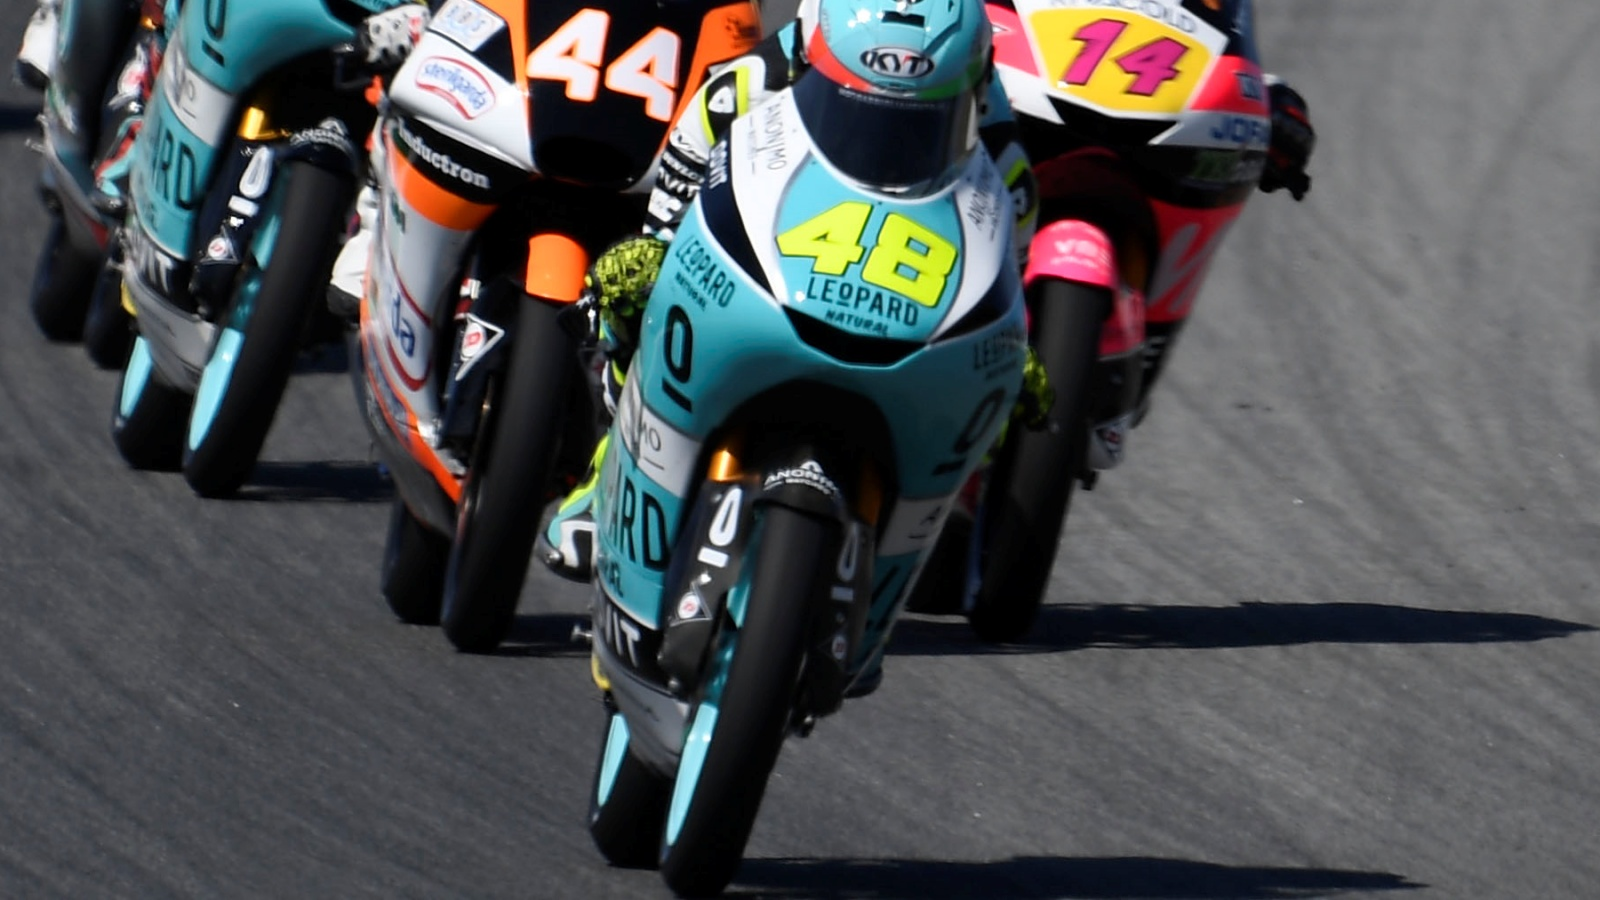 Lorenzo Dalla Porta será campeón del mundo de Moto3 2019 en Australia si…